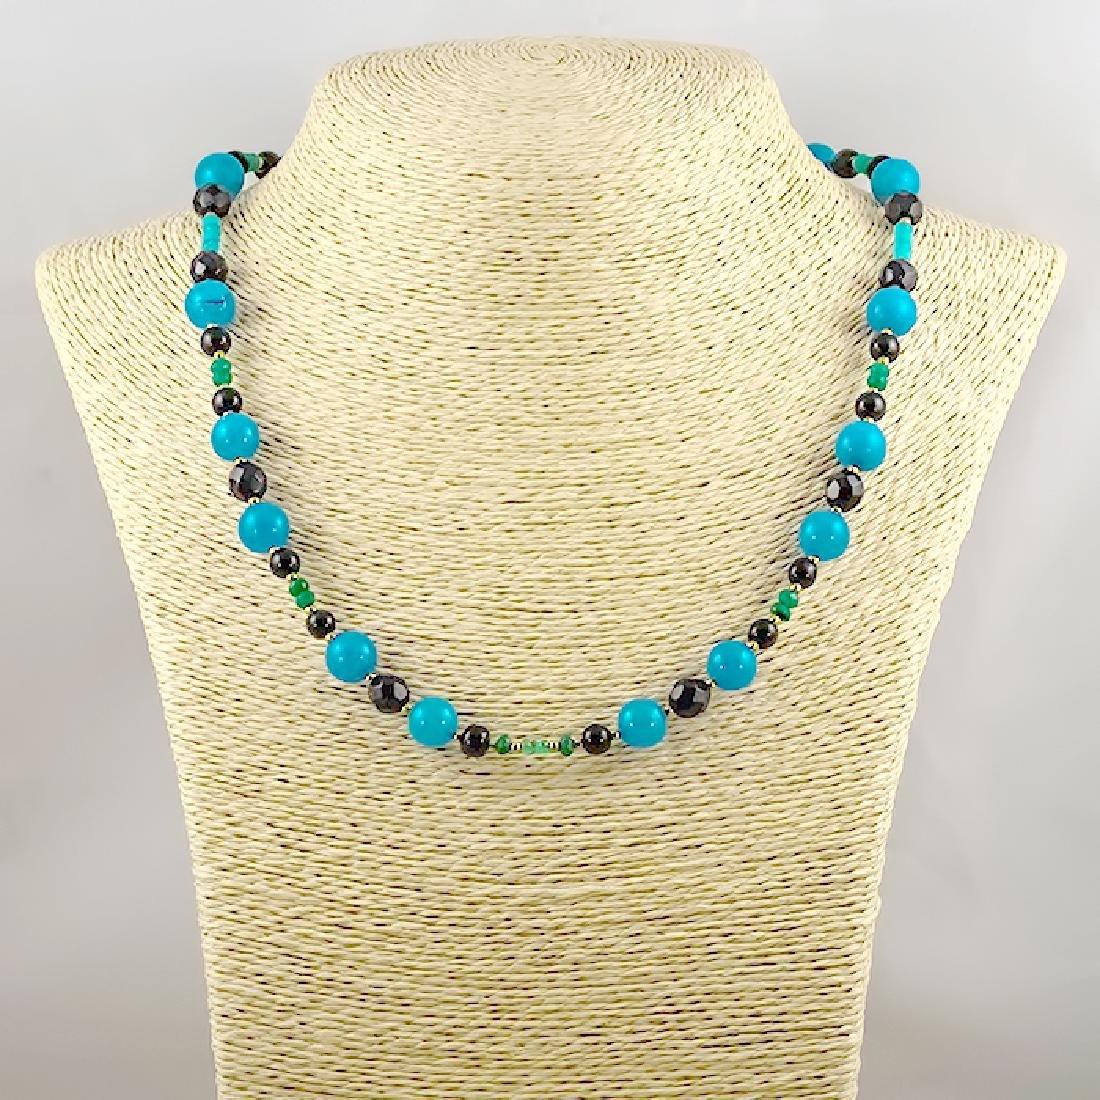 Jade Necklace with Emeralds, Aquamarine, Black and - 4